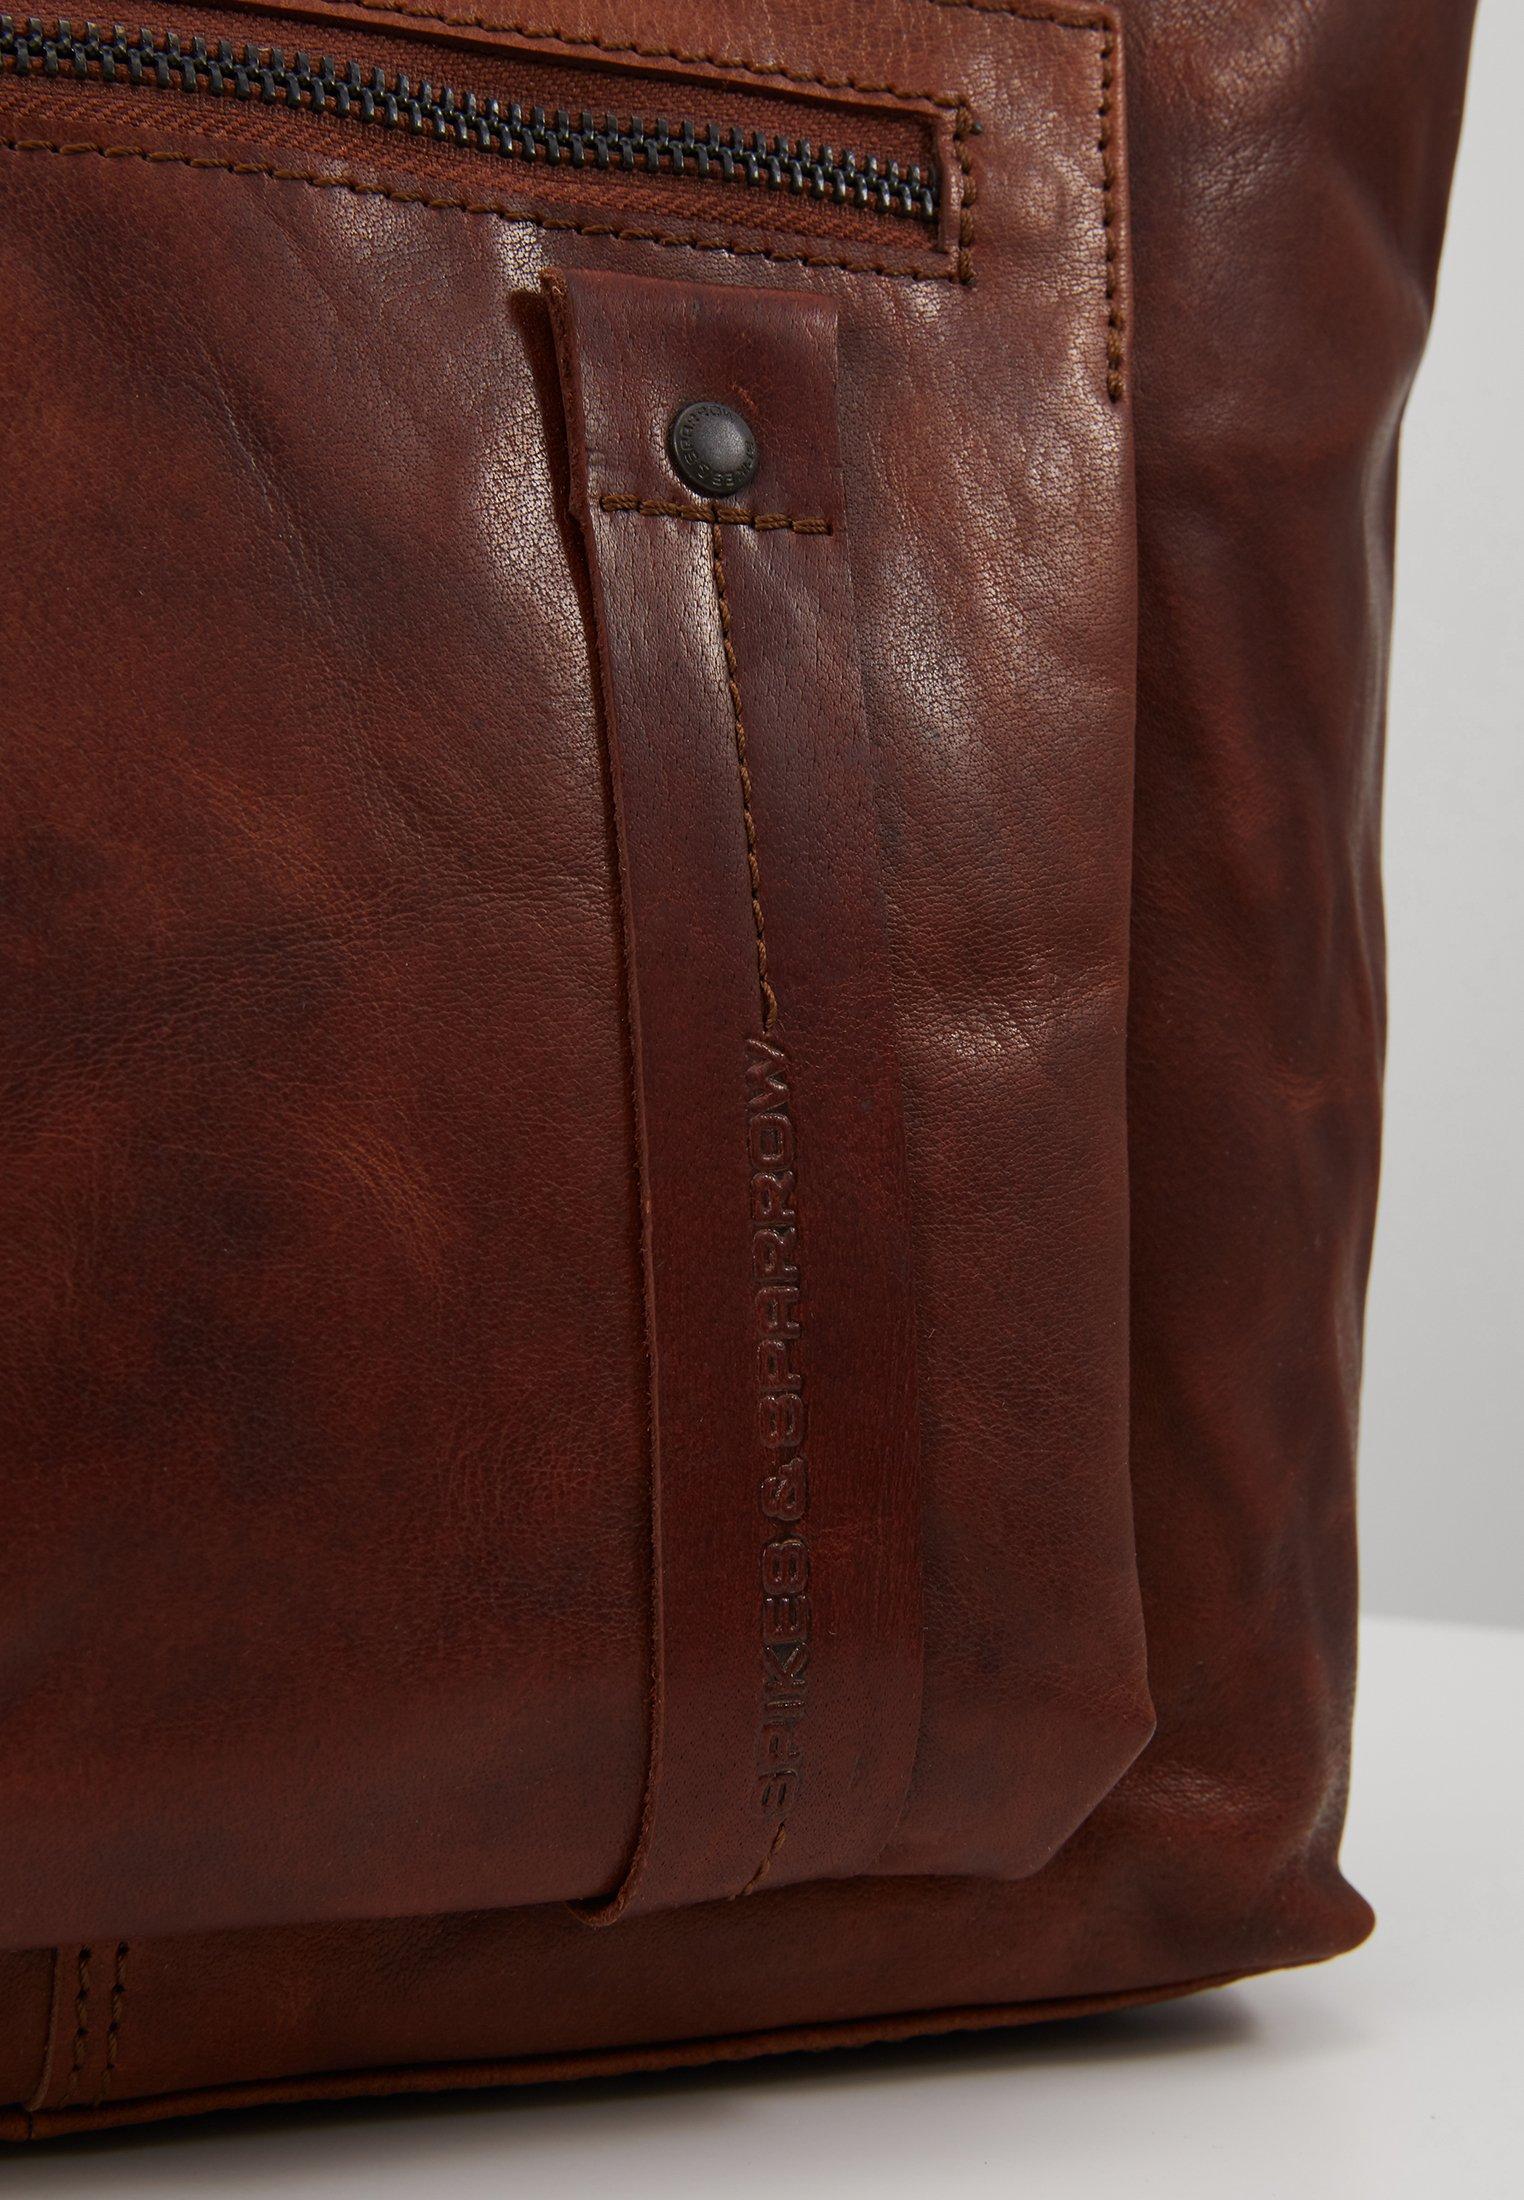 Online Shopping Accessories Spikes & Sparrow Briefcase brandy 4ruHVtVbe